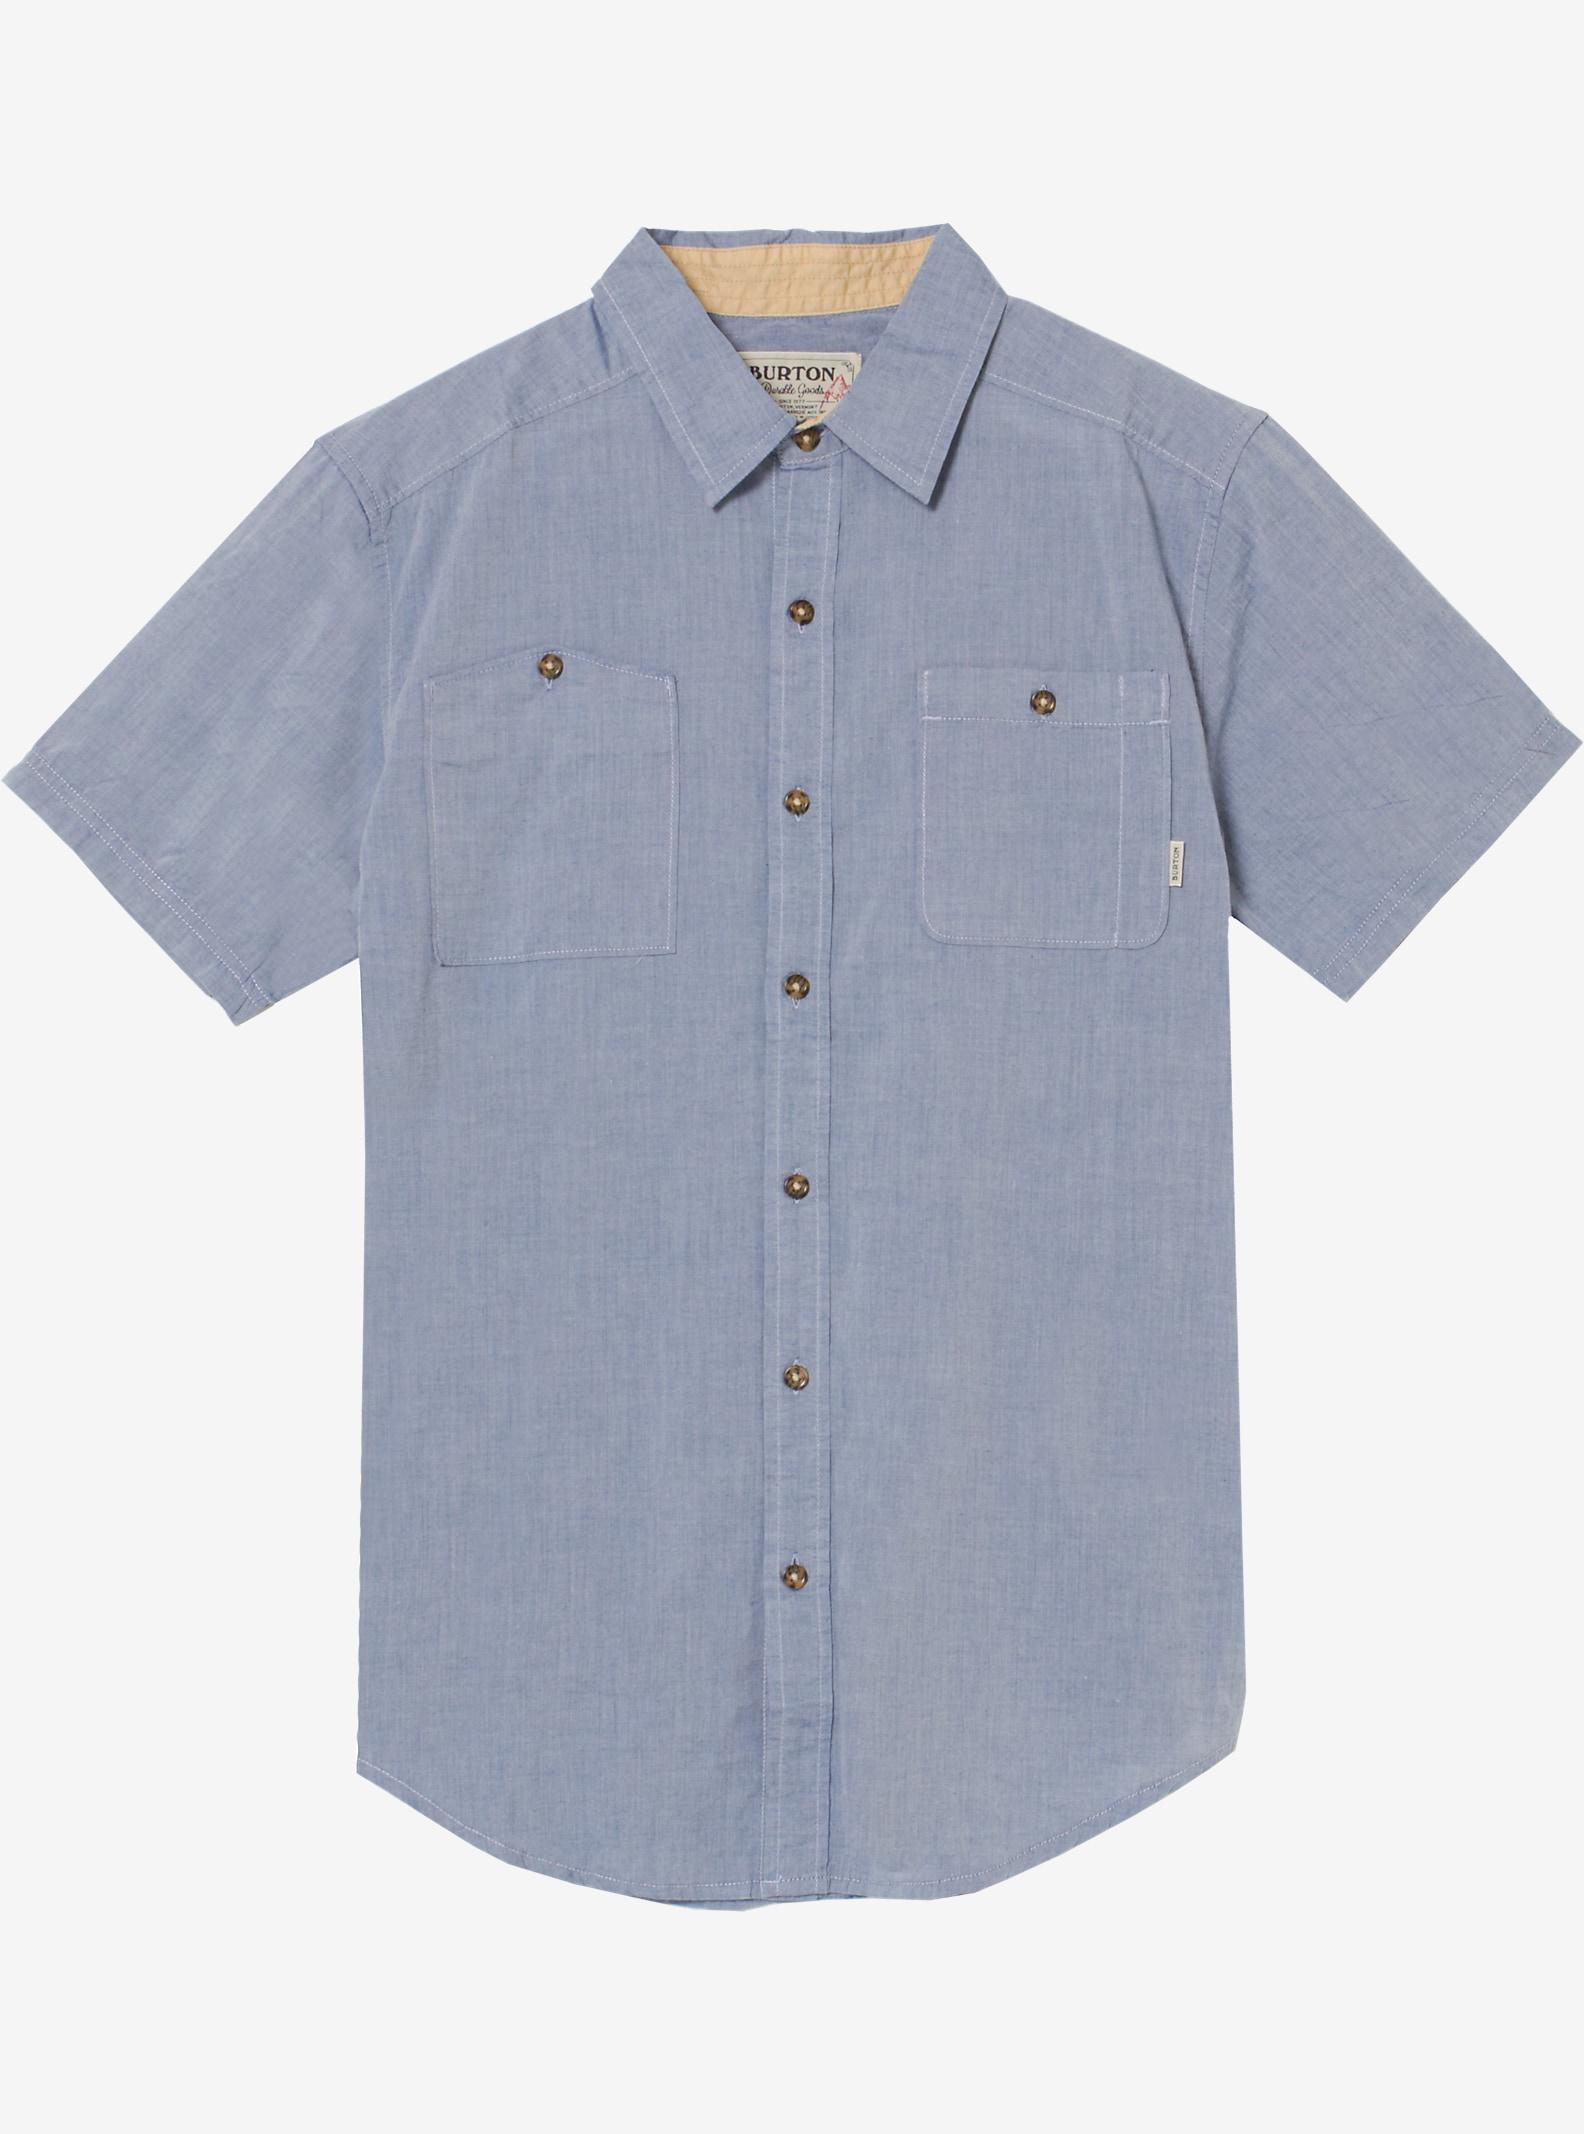 Burton Glade Kurzarmhemd angezeigt in Light Chambray